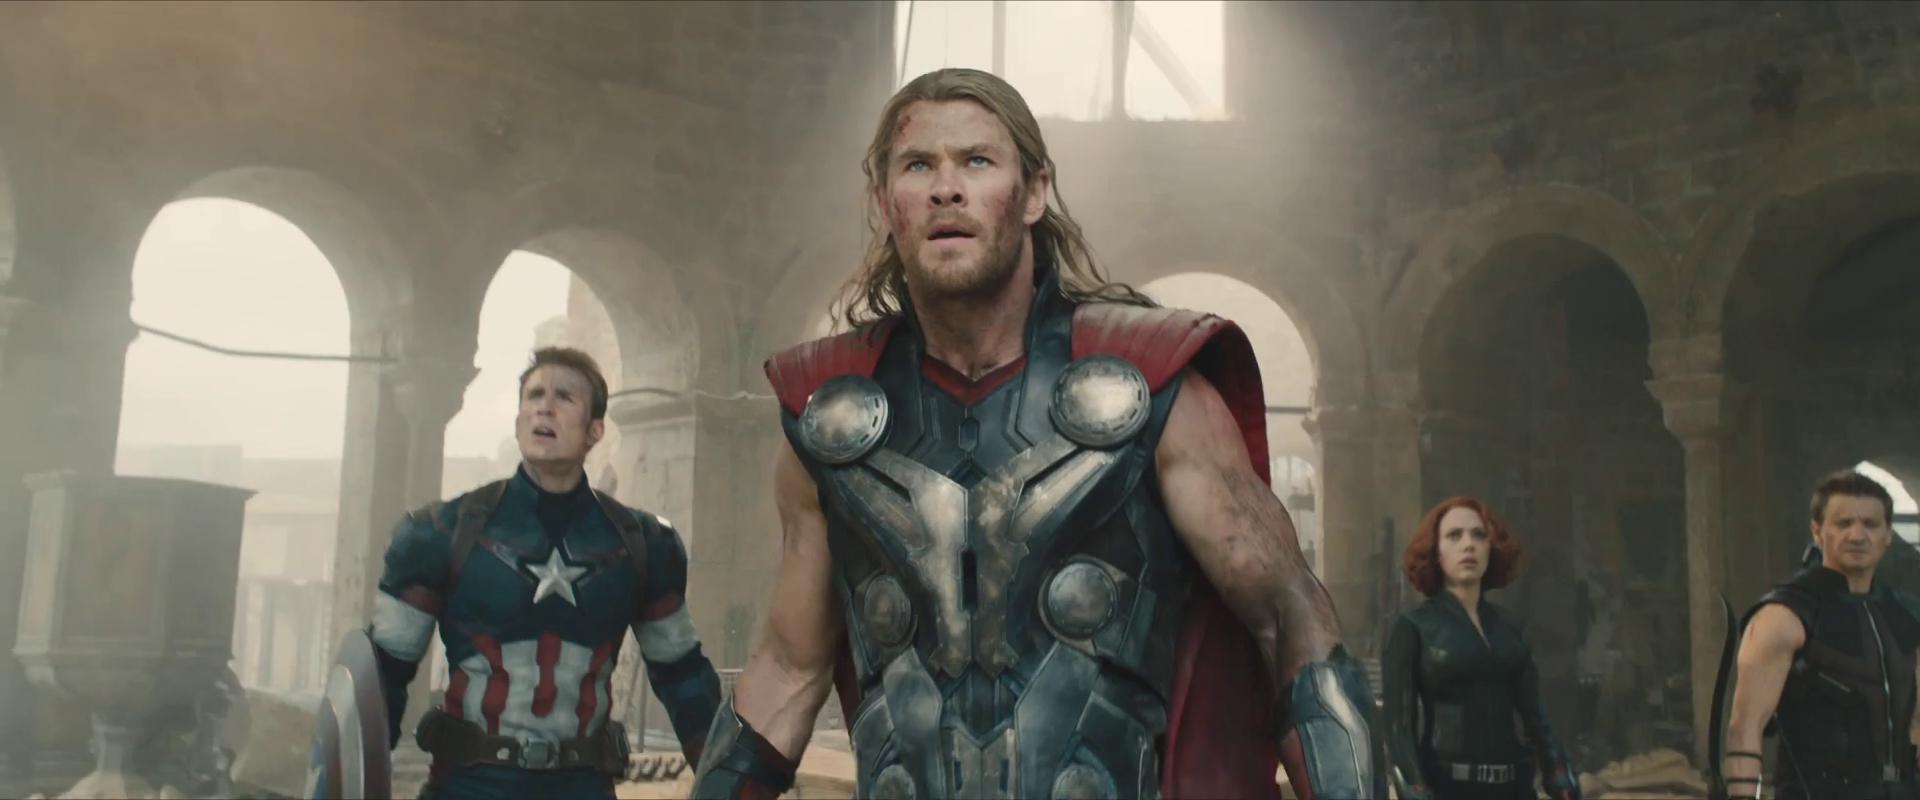 avengers-age-of-ultron-trailer-screengrab-13-chris-hemsworth-chris-evans.png